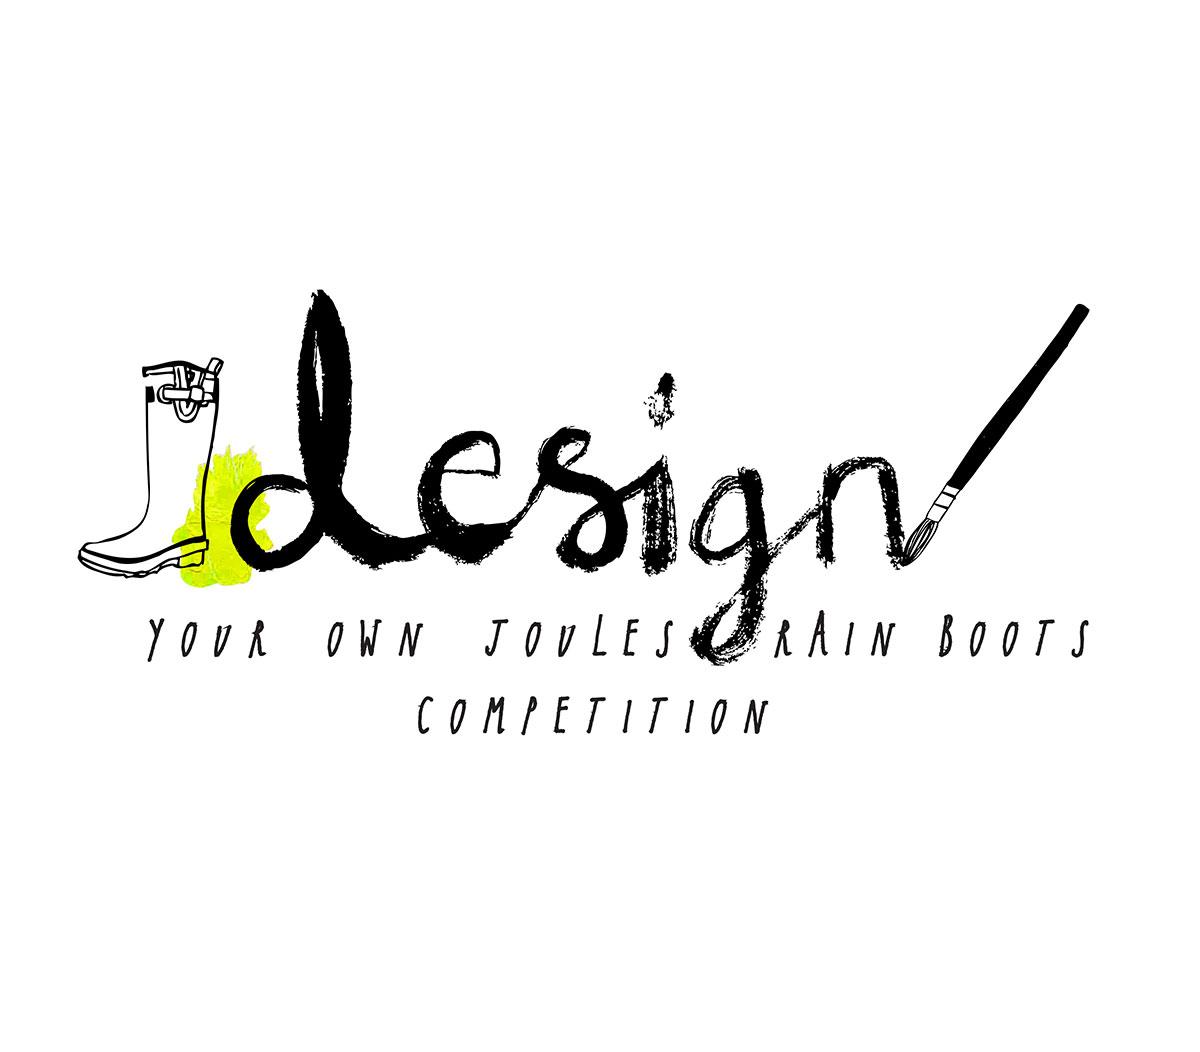 Joules Design Contest